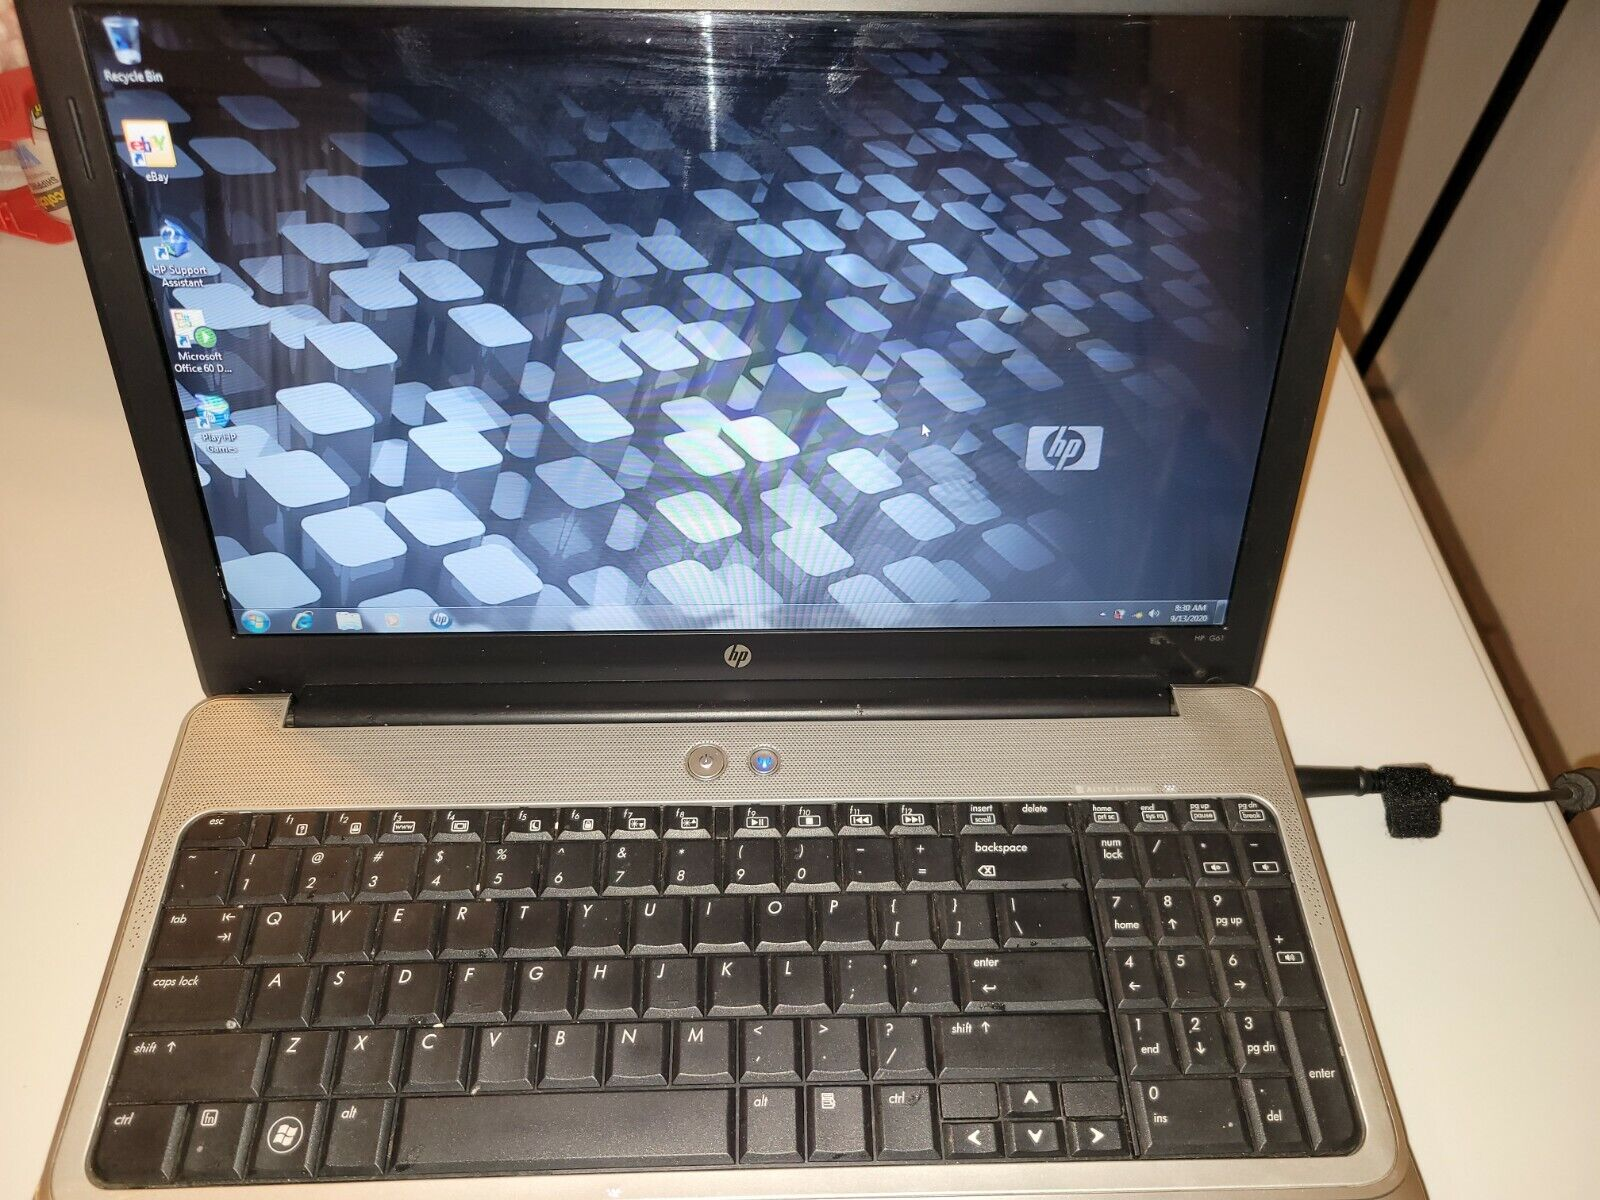 "Laptop Windows - HP Laptop G61-429WM AMD Sempron M120 15.6"" Windows 7 Home Premium 64-bit"